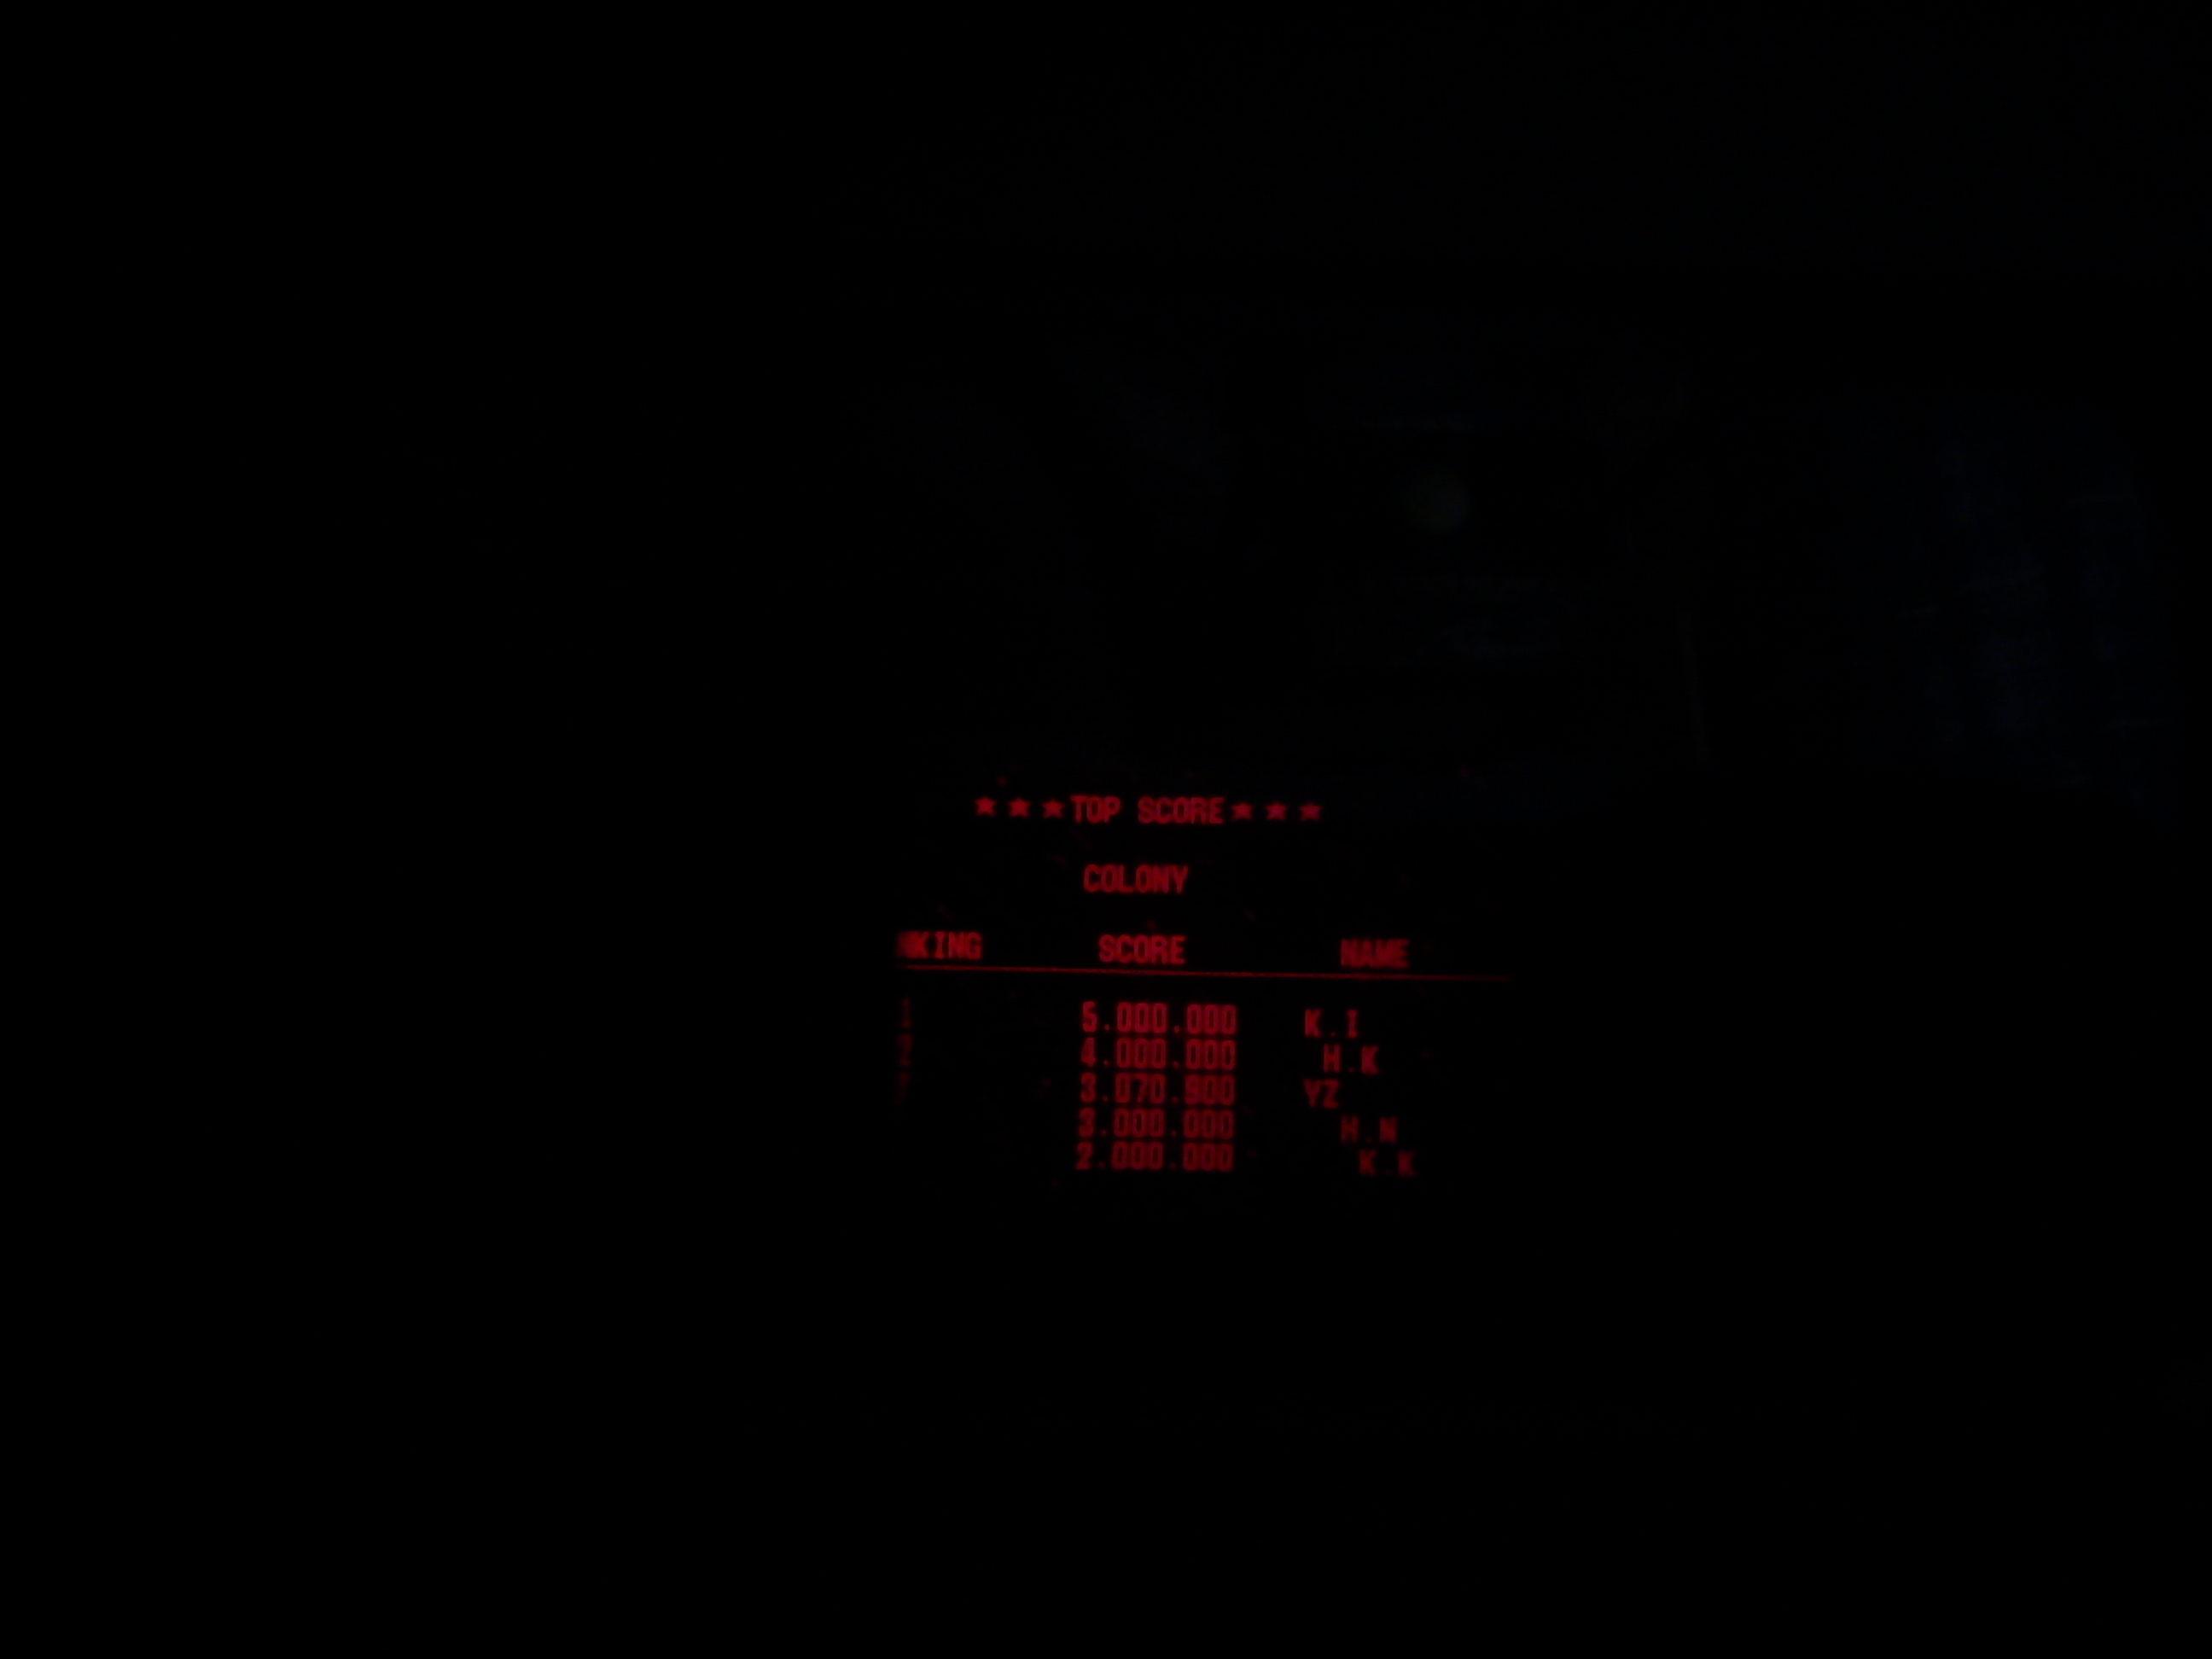 Fr0st: Galactic Pinball: Colony (Virtual Boy) 3,070,900 points on 2014-08-04 13:10:45